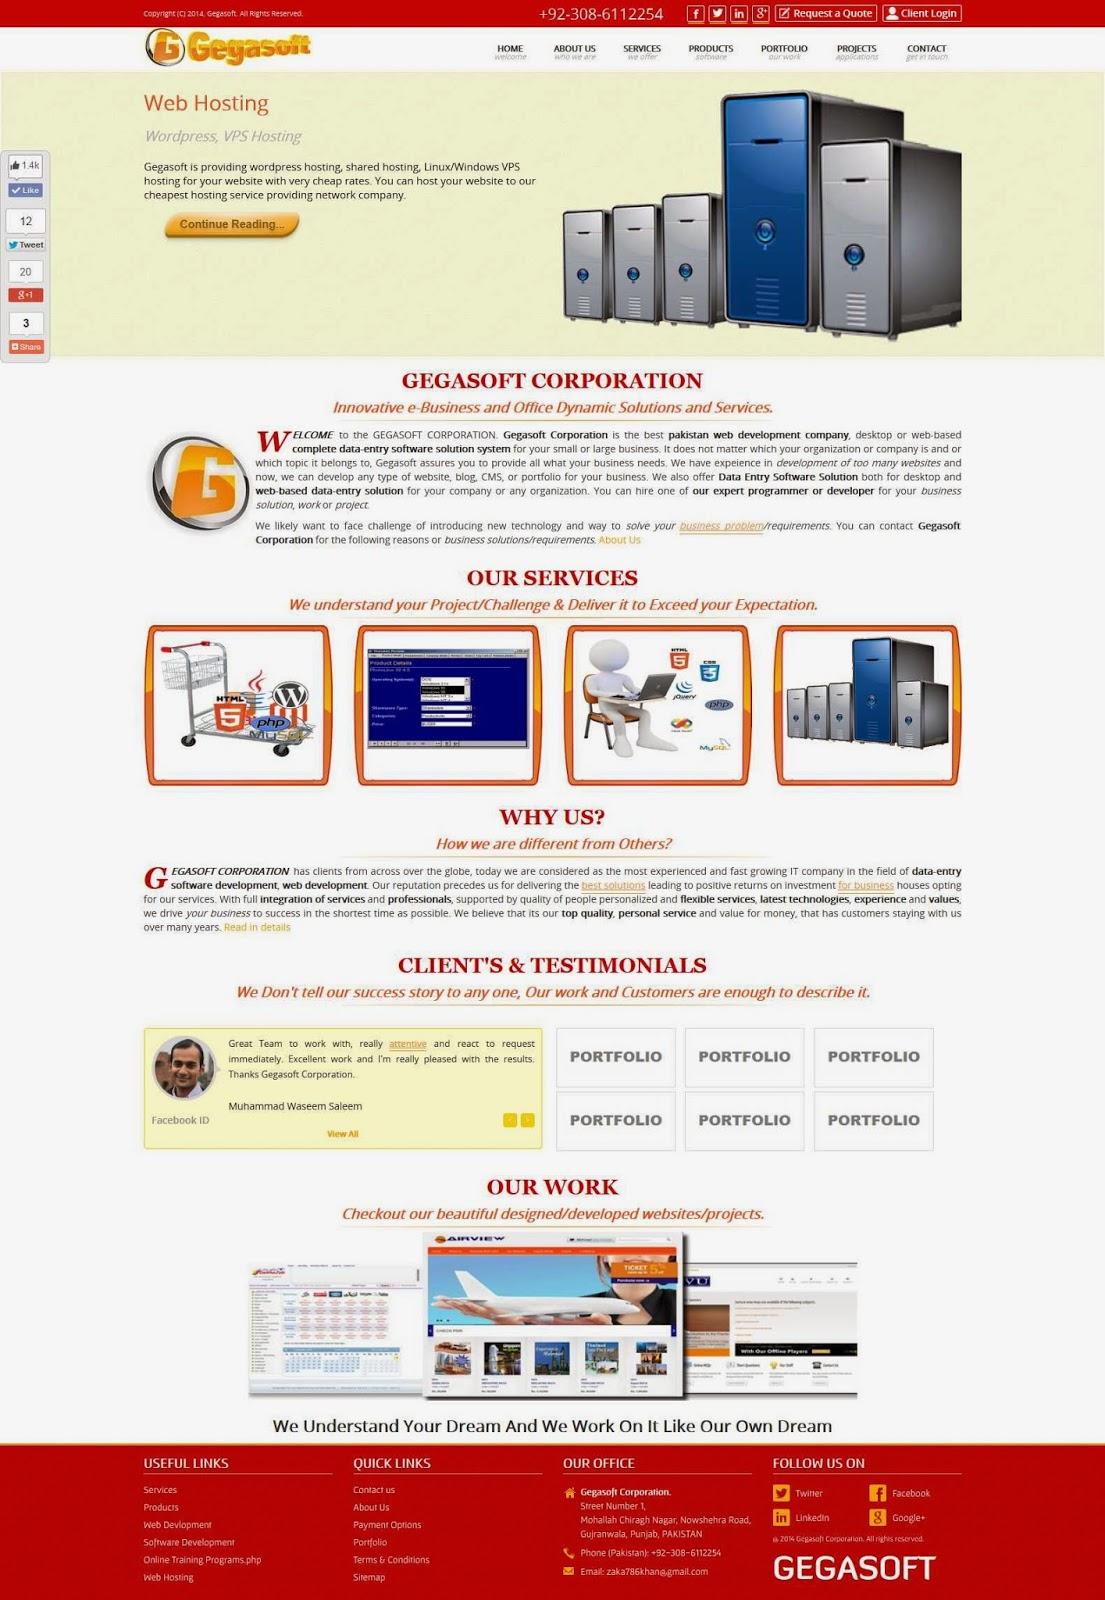 Ge Online Service Login New Theme Of Gegasoft Corporation Website Web Hosting Web